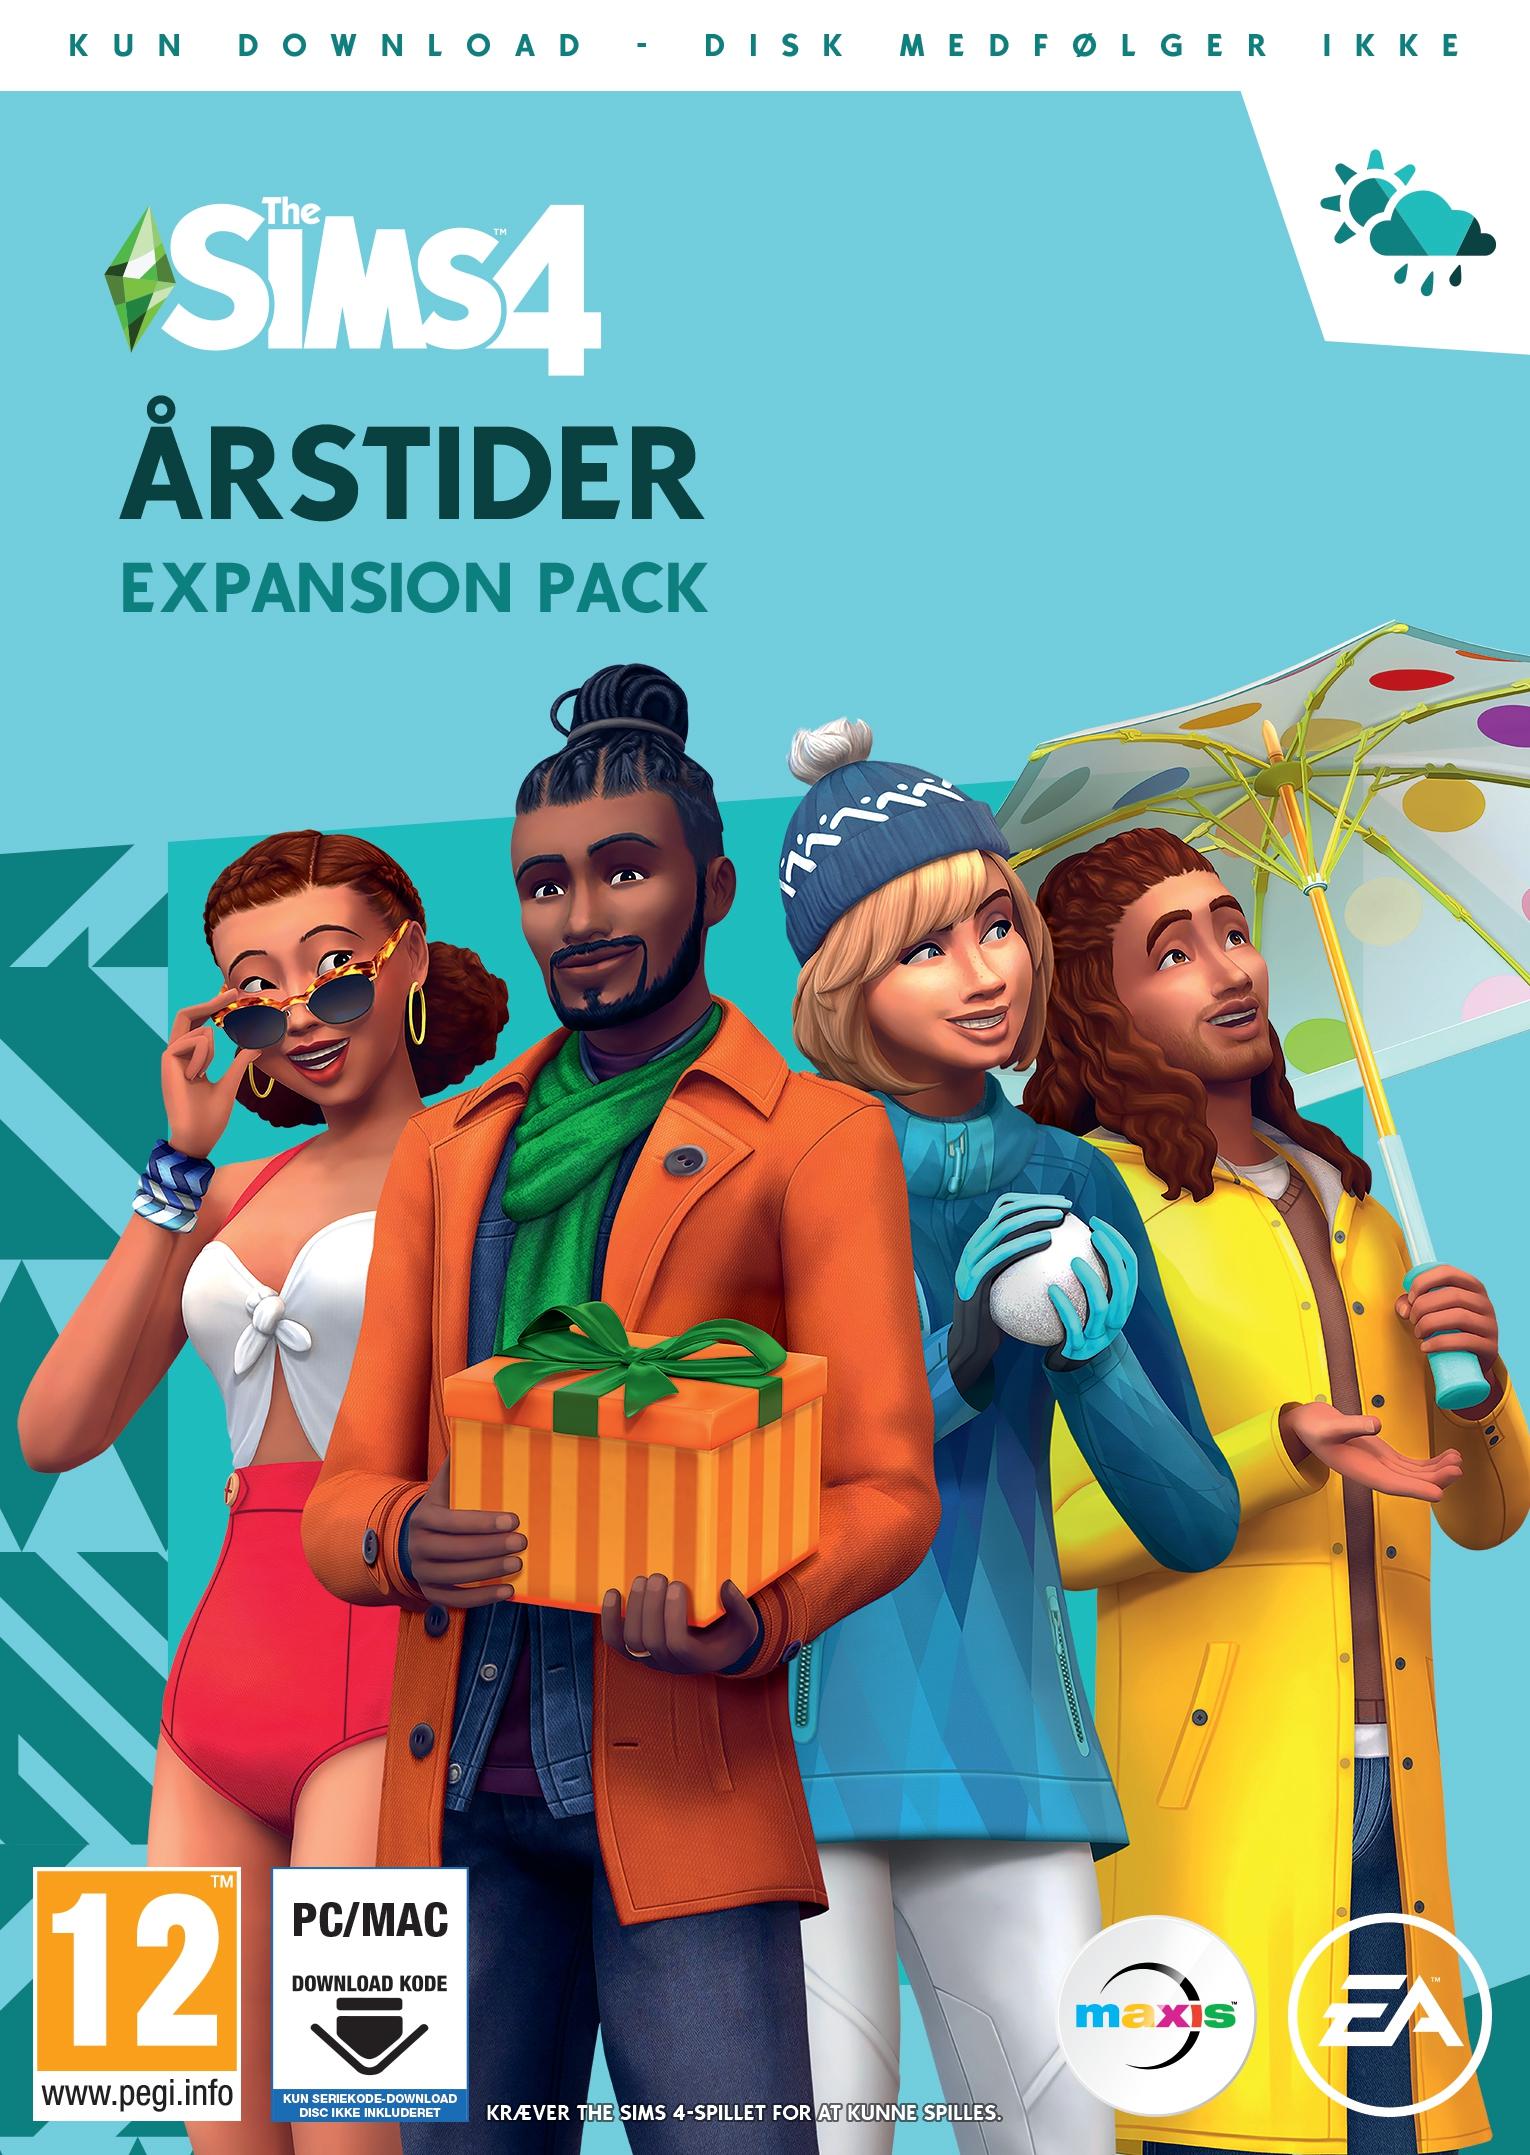 The Sims 4 Seasons (DK) Code in a Box